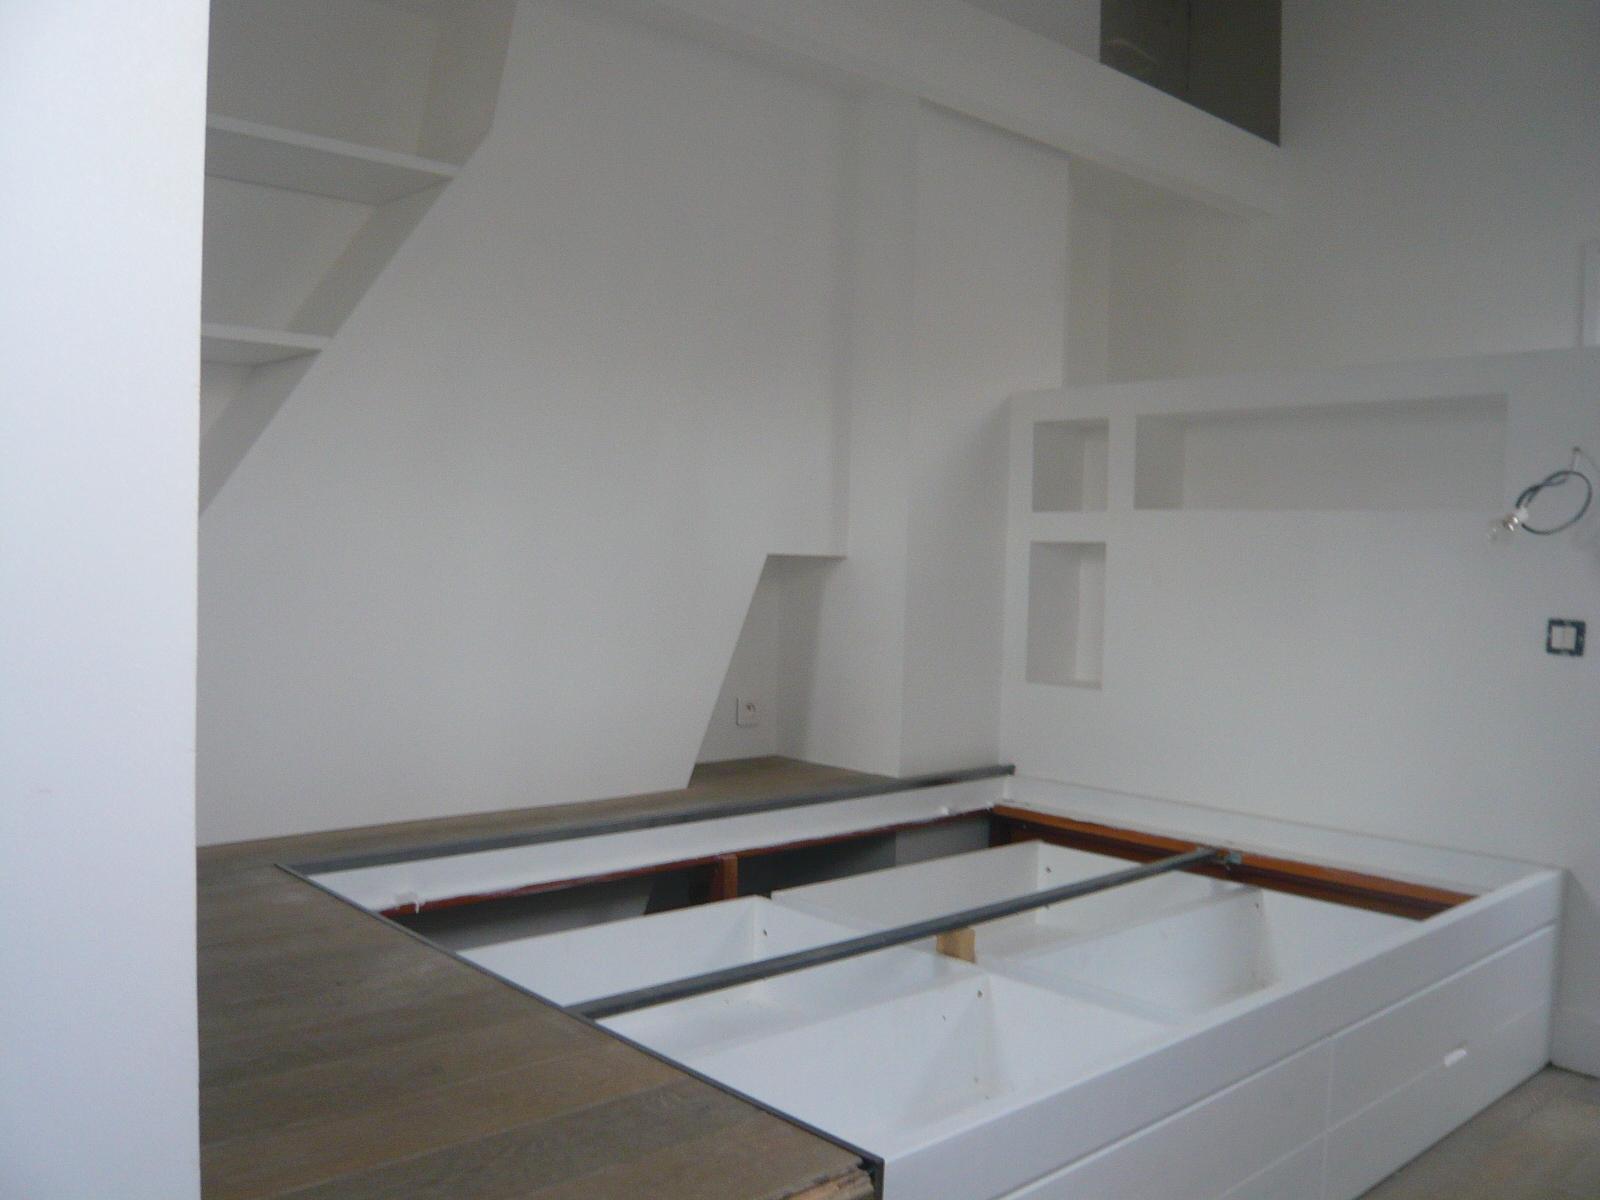 Lit Estrade Chambre Studio Studio Creer Amenagement Salon Orsay